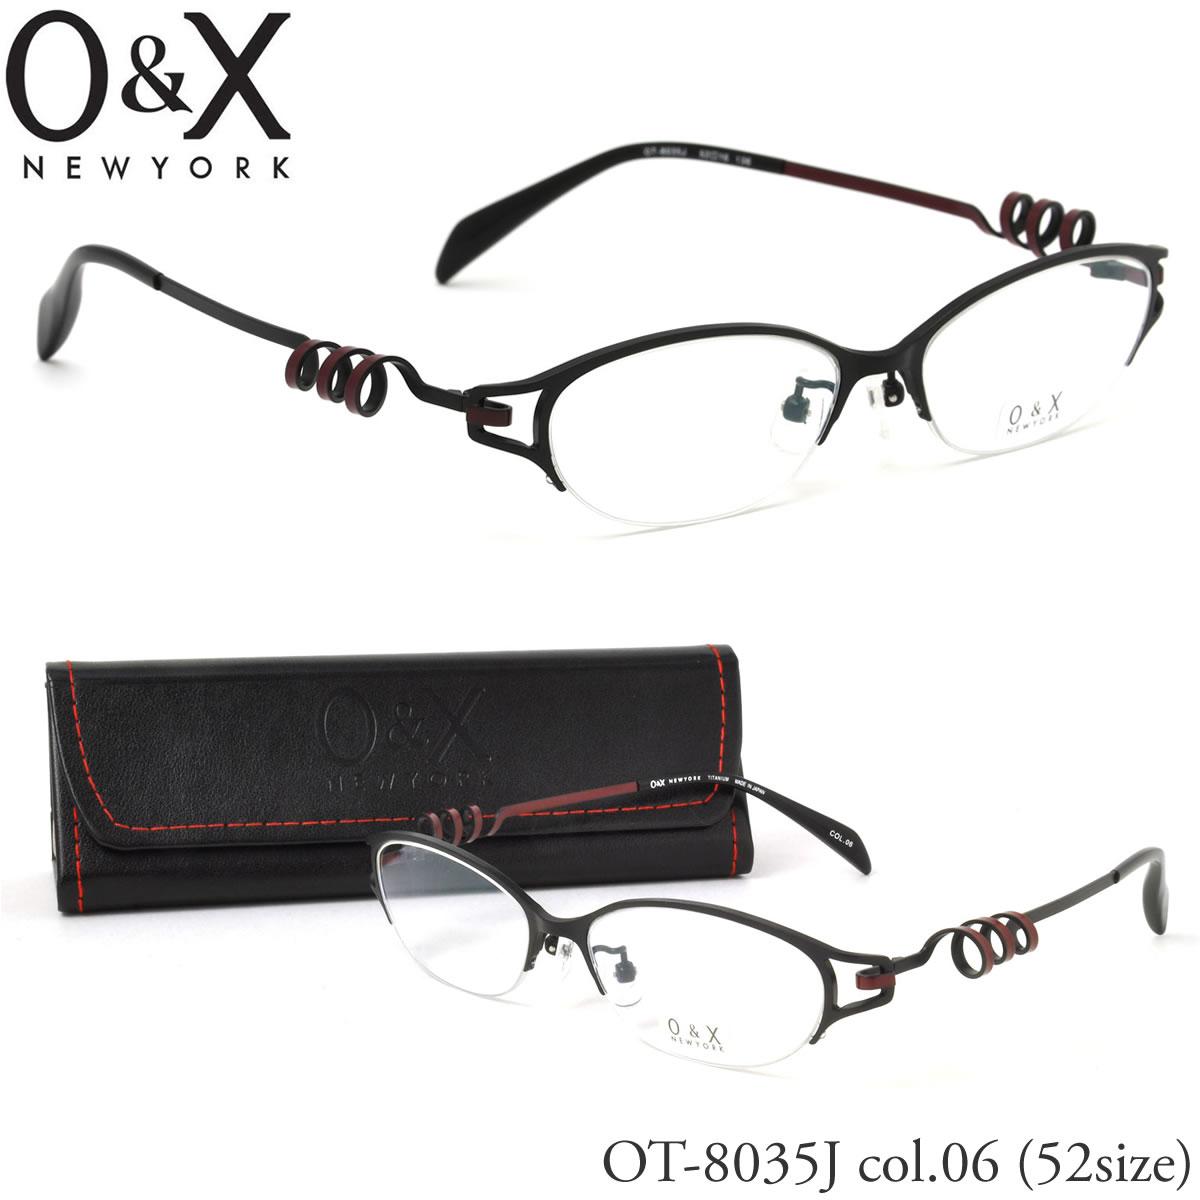 O&X オーアンドエックス メガネ フレーム OT 8035J 06 52サイズ オーバル ナイロール βTITANIUM ベータチタン 日本製 シートメタル オーアンドエックス O&X メンズ レディース